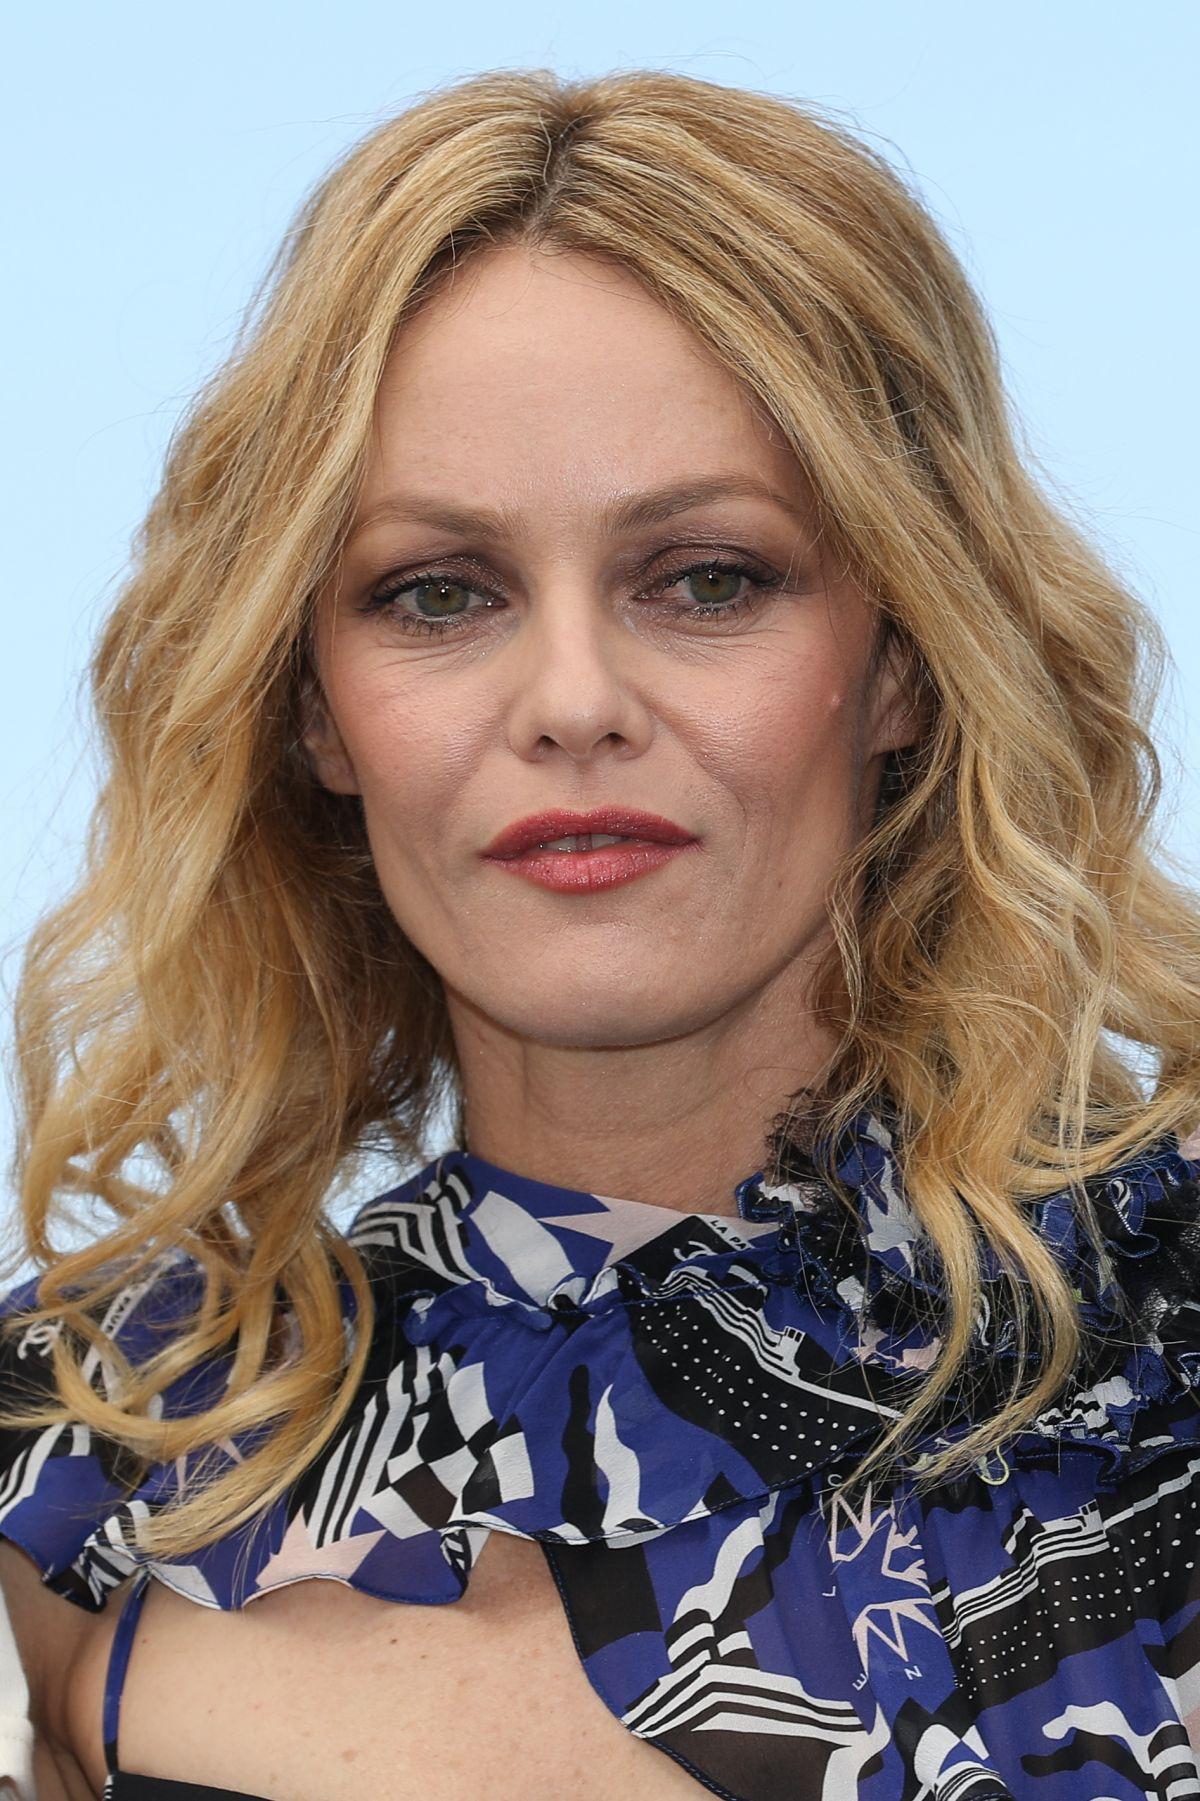 VANESSA PARADIS at Knife + Heart Photocall at Cannes Film ... Vanessa Paradis